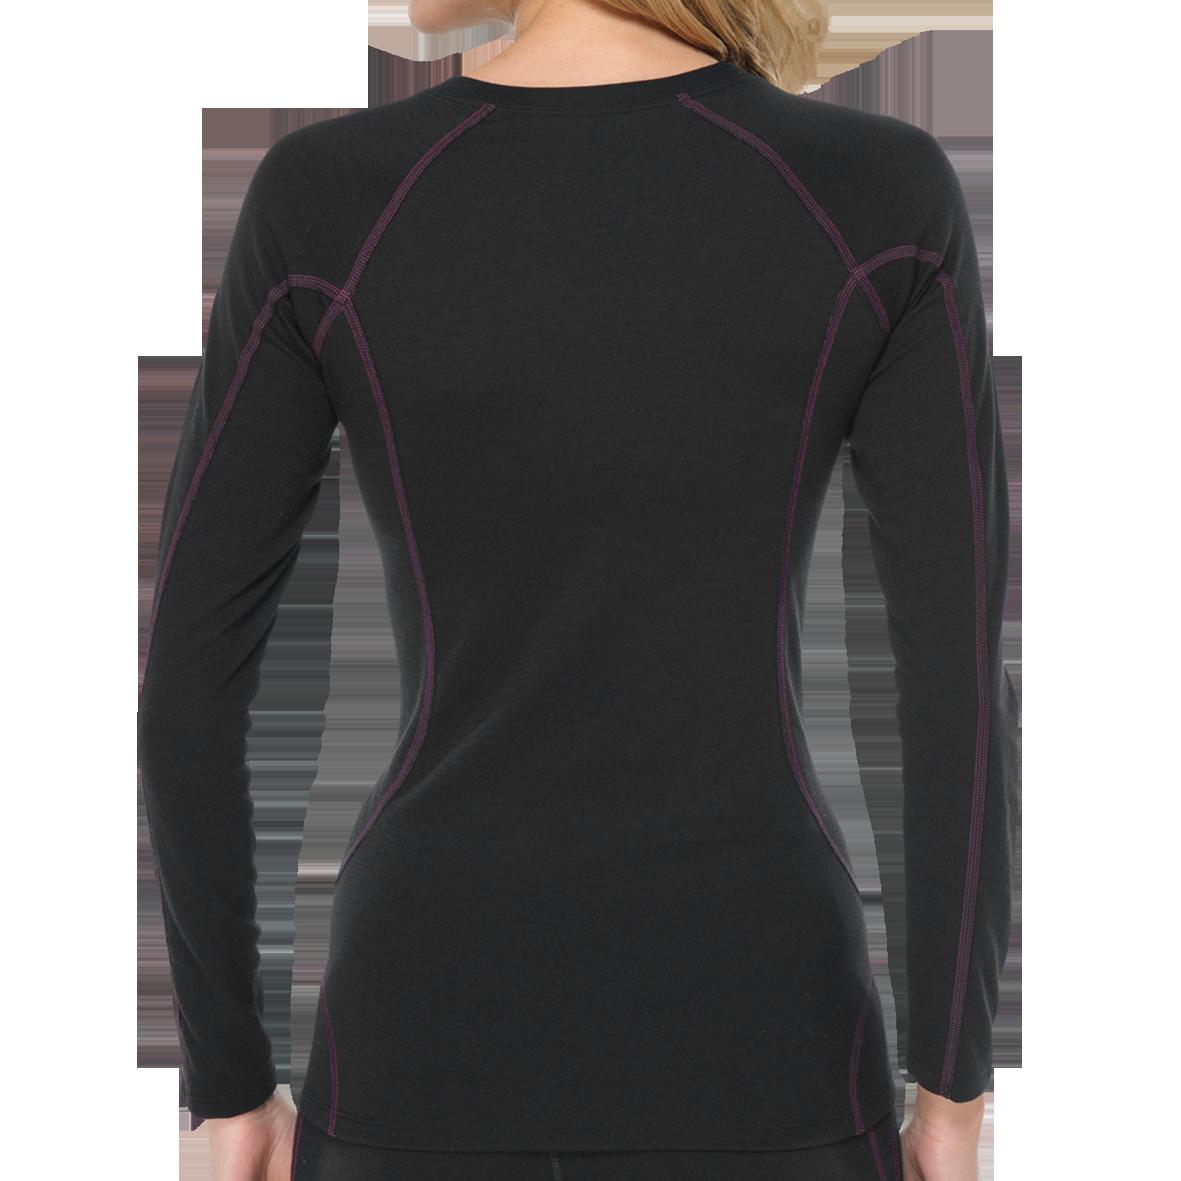 Thermo T-shirt met lange mouw 135302 - zwart-2